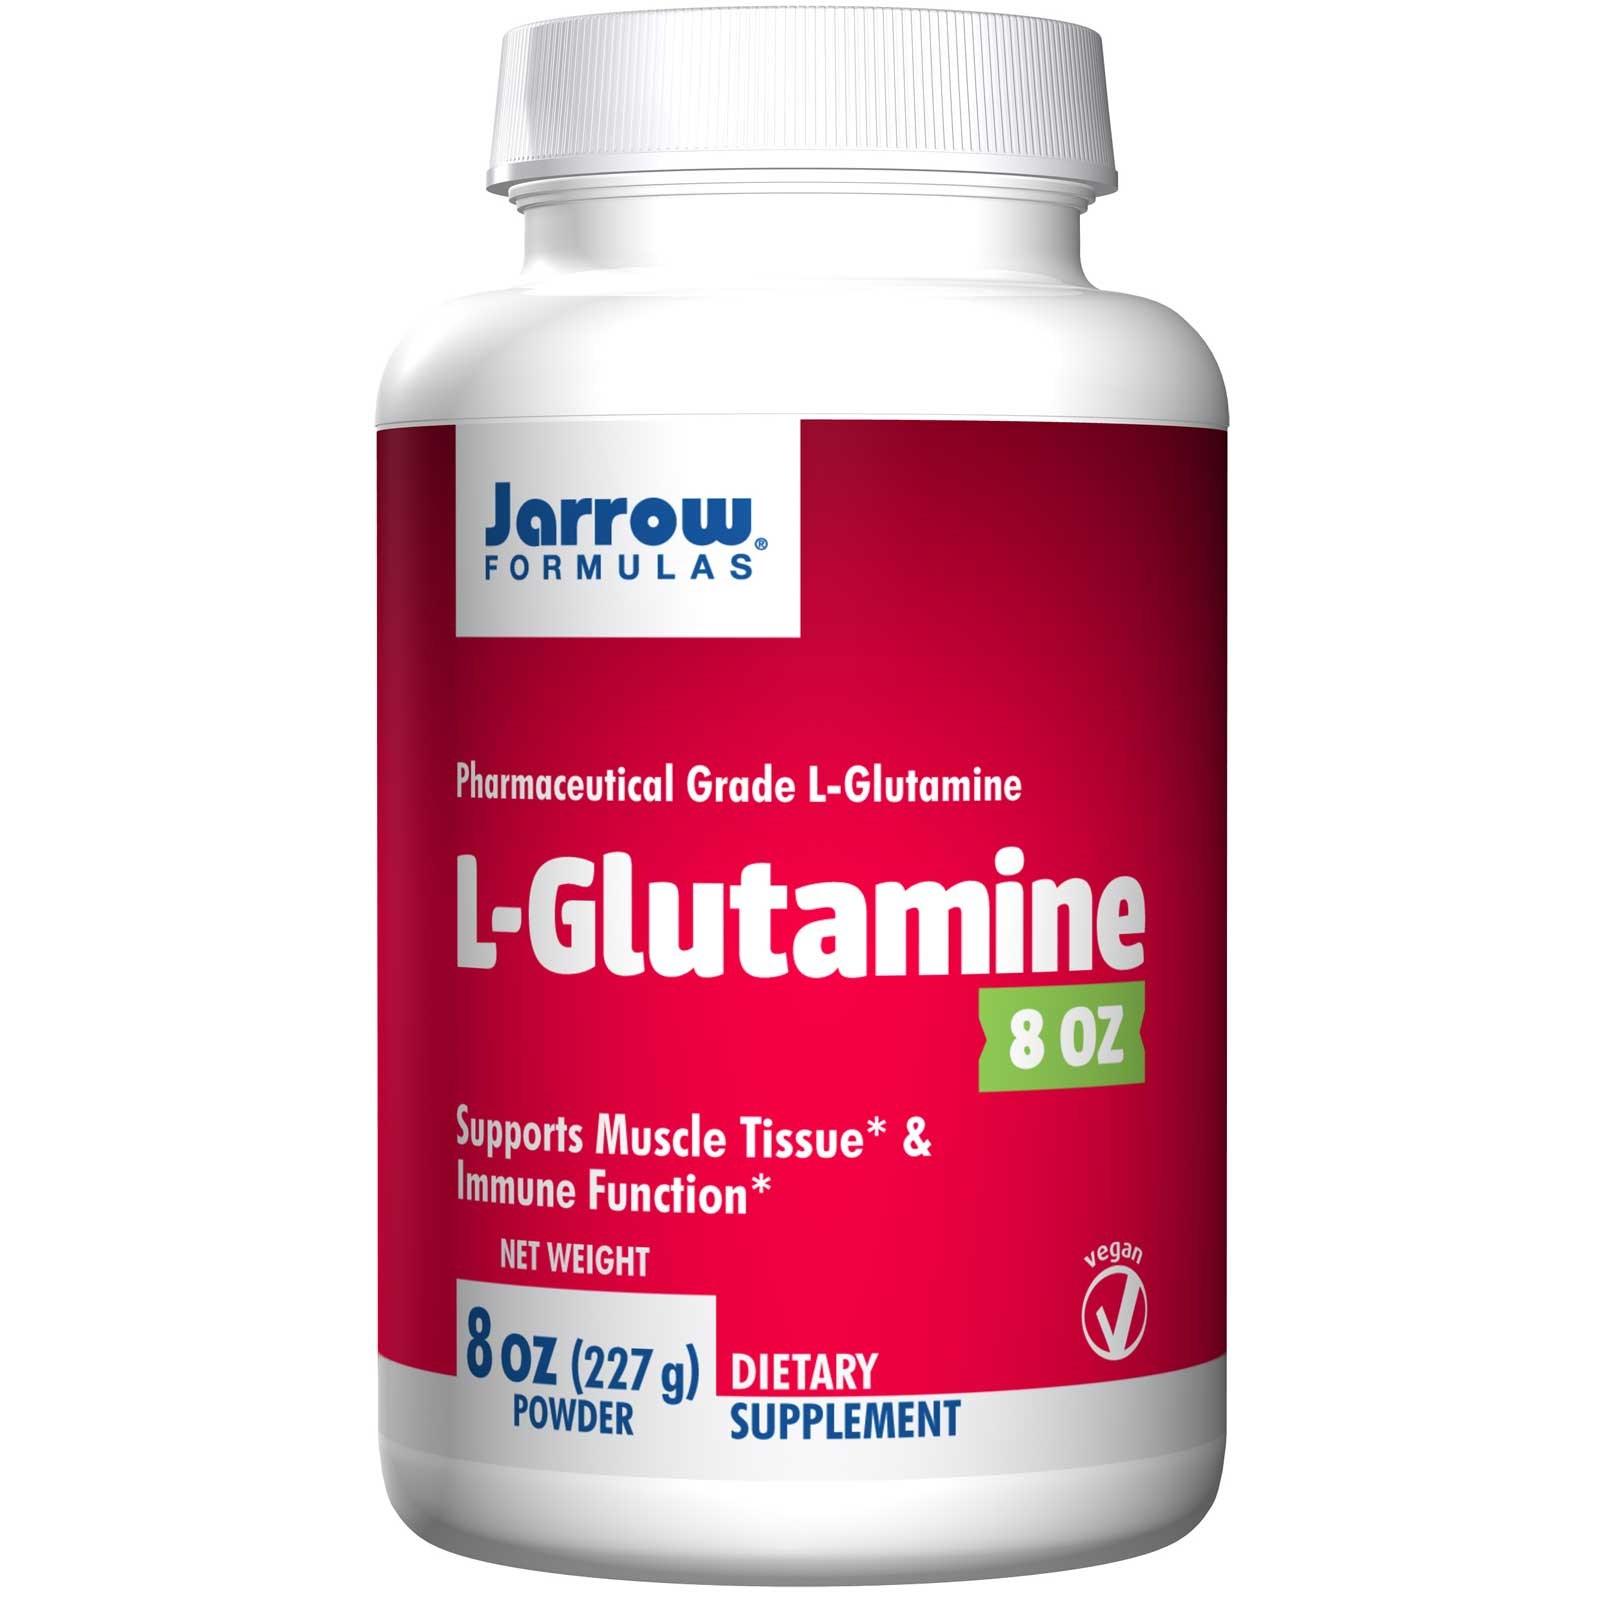 Image of L-Glutamine Powder (227 gram) - Jarrow Formulas 0790011150077